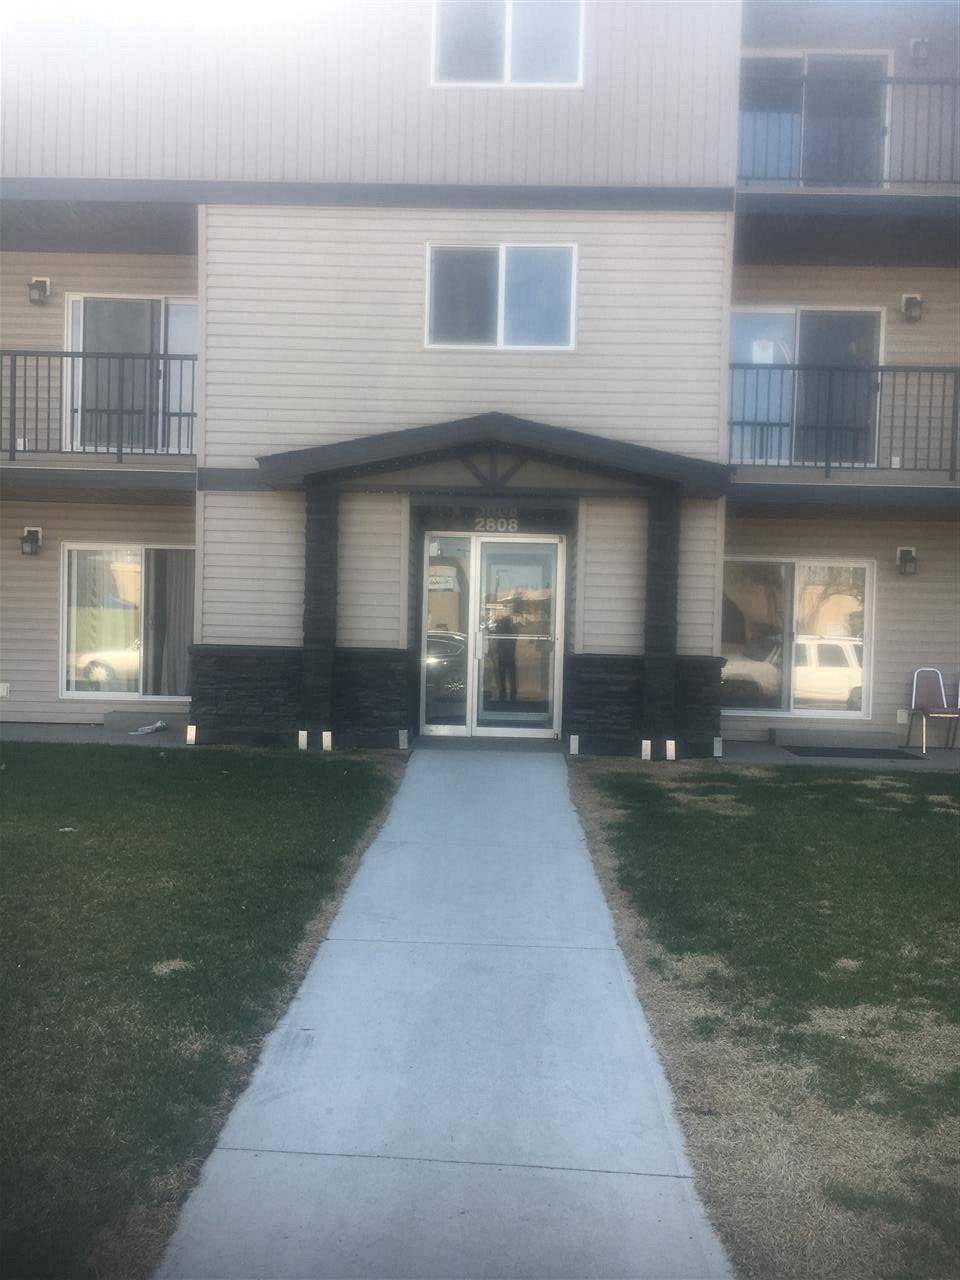 6A 2808 116 Street, 2 bed, 1 bath, at $124,900